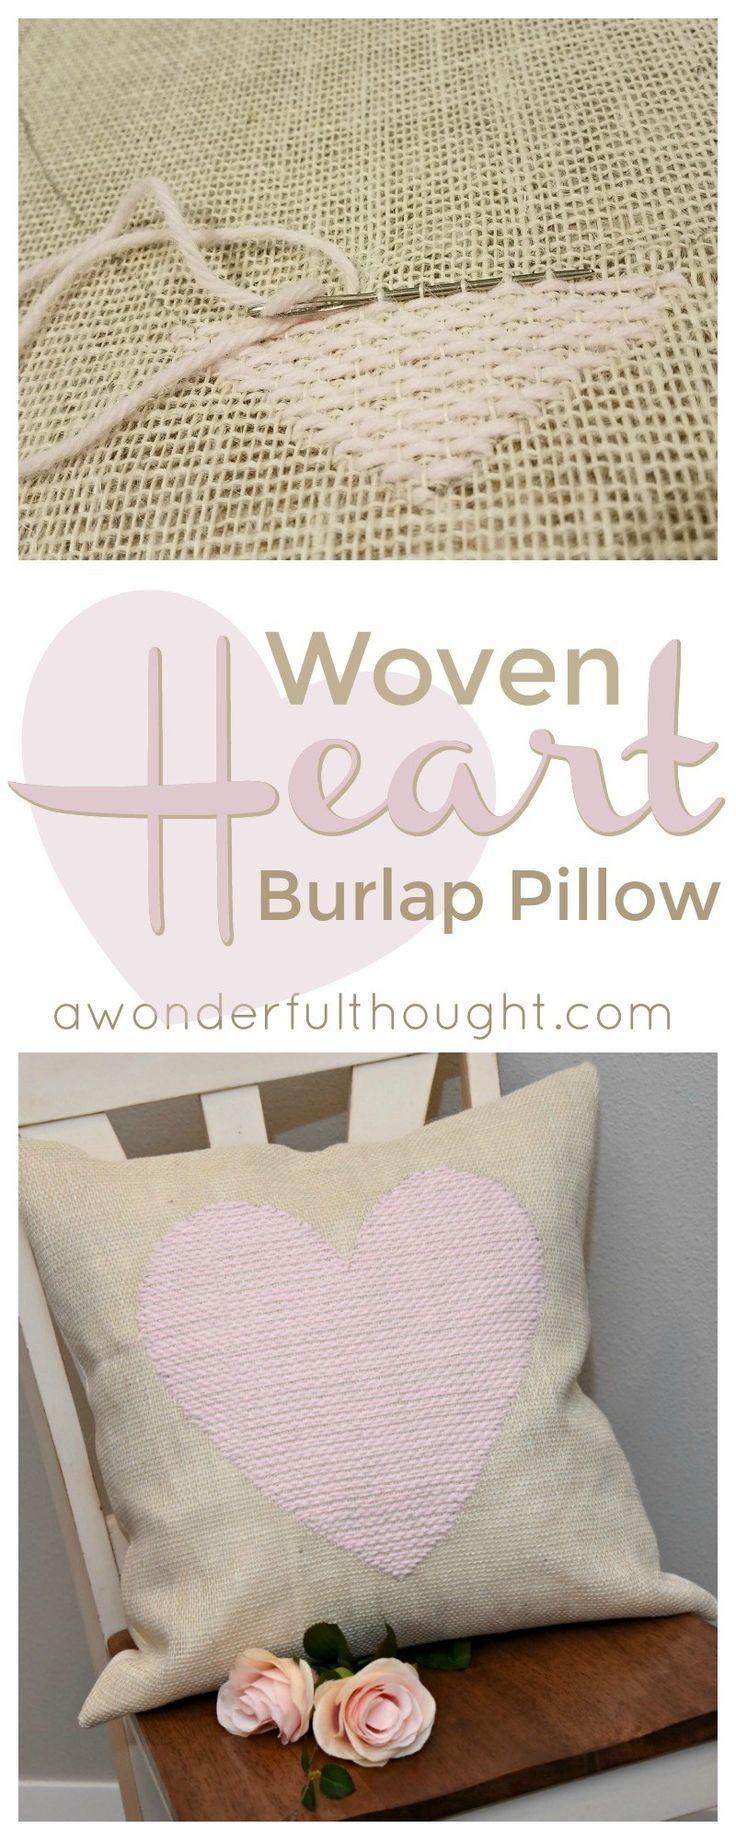 DIY Woven Heart Burlap Pillow | http://awonderfulthought.com